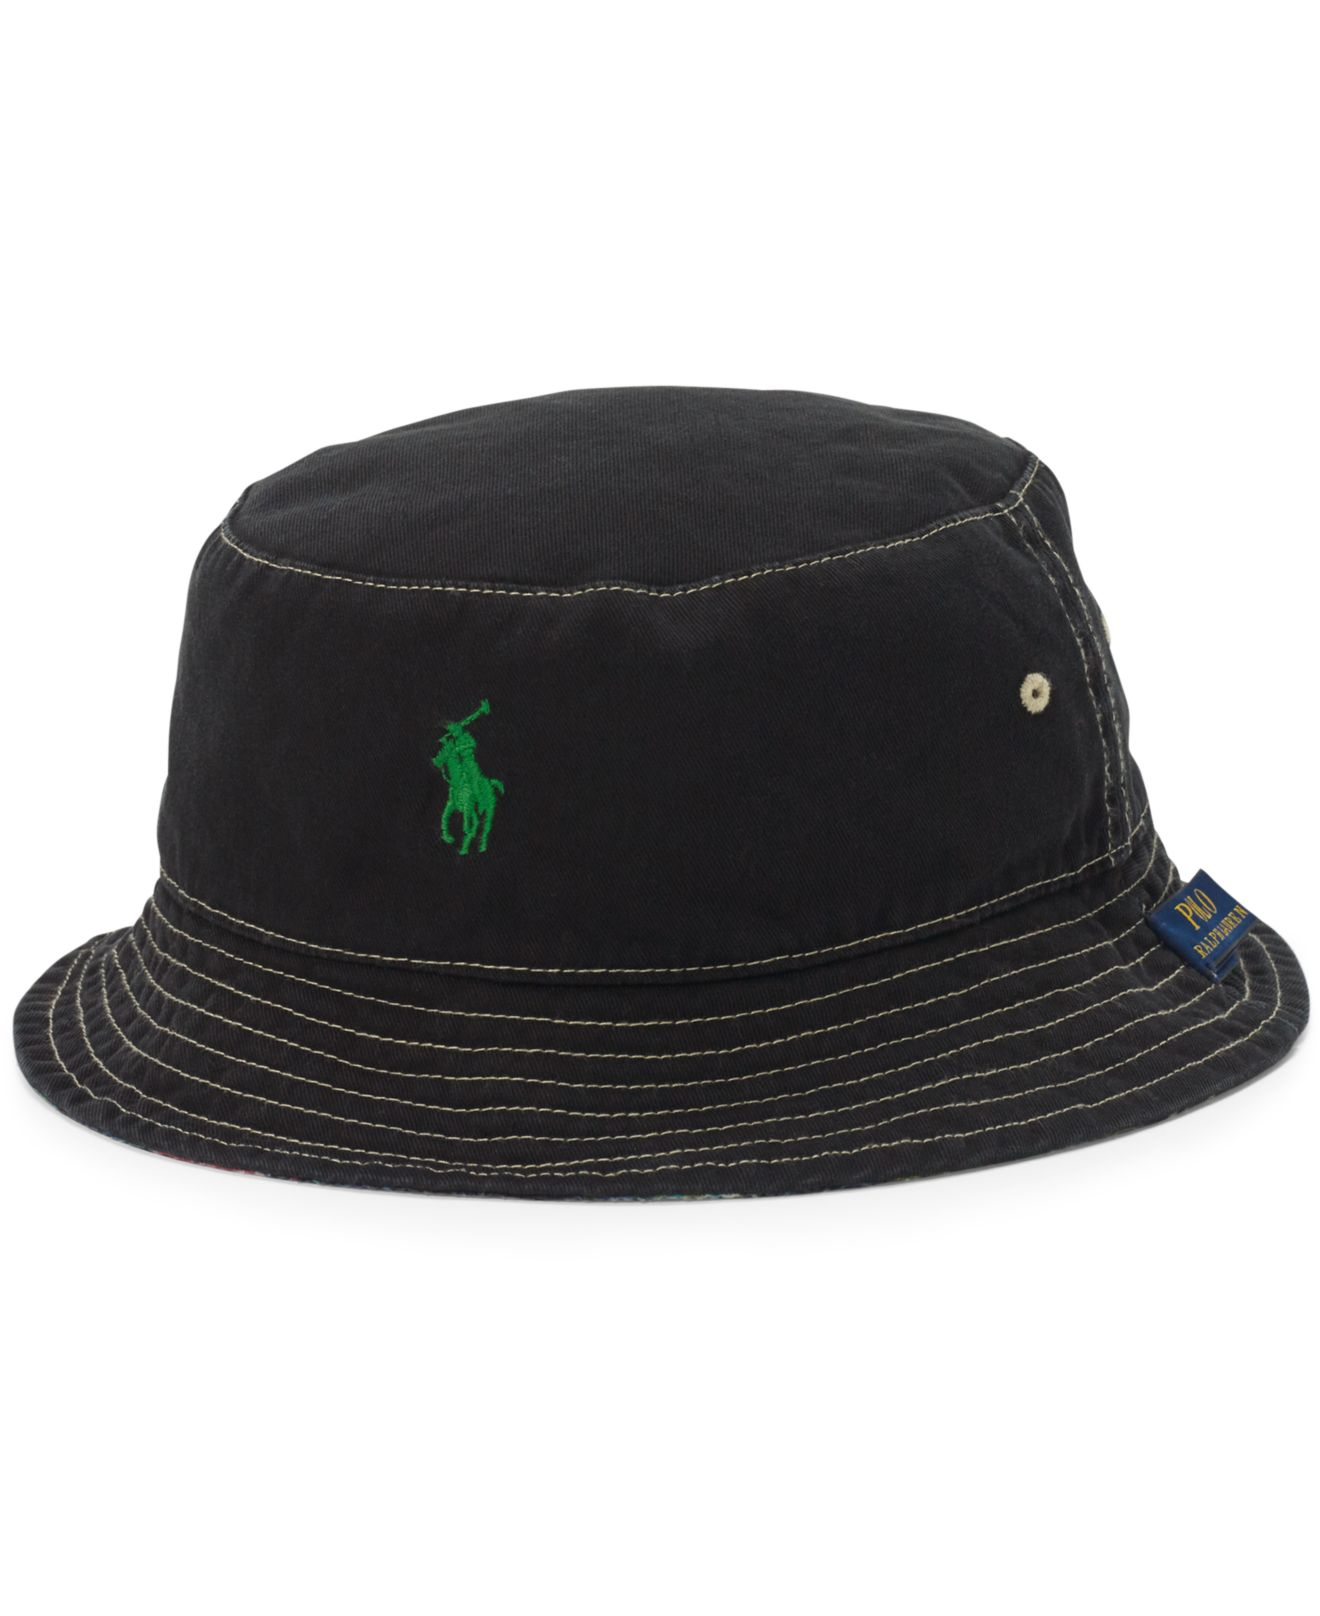 Lyst - Polo Ralph Lauren Flamingo-print Reversible Bucket Hat for Men a37bb8f4931